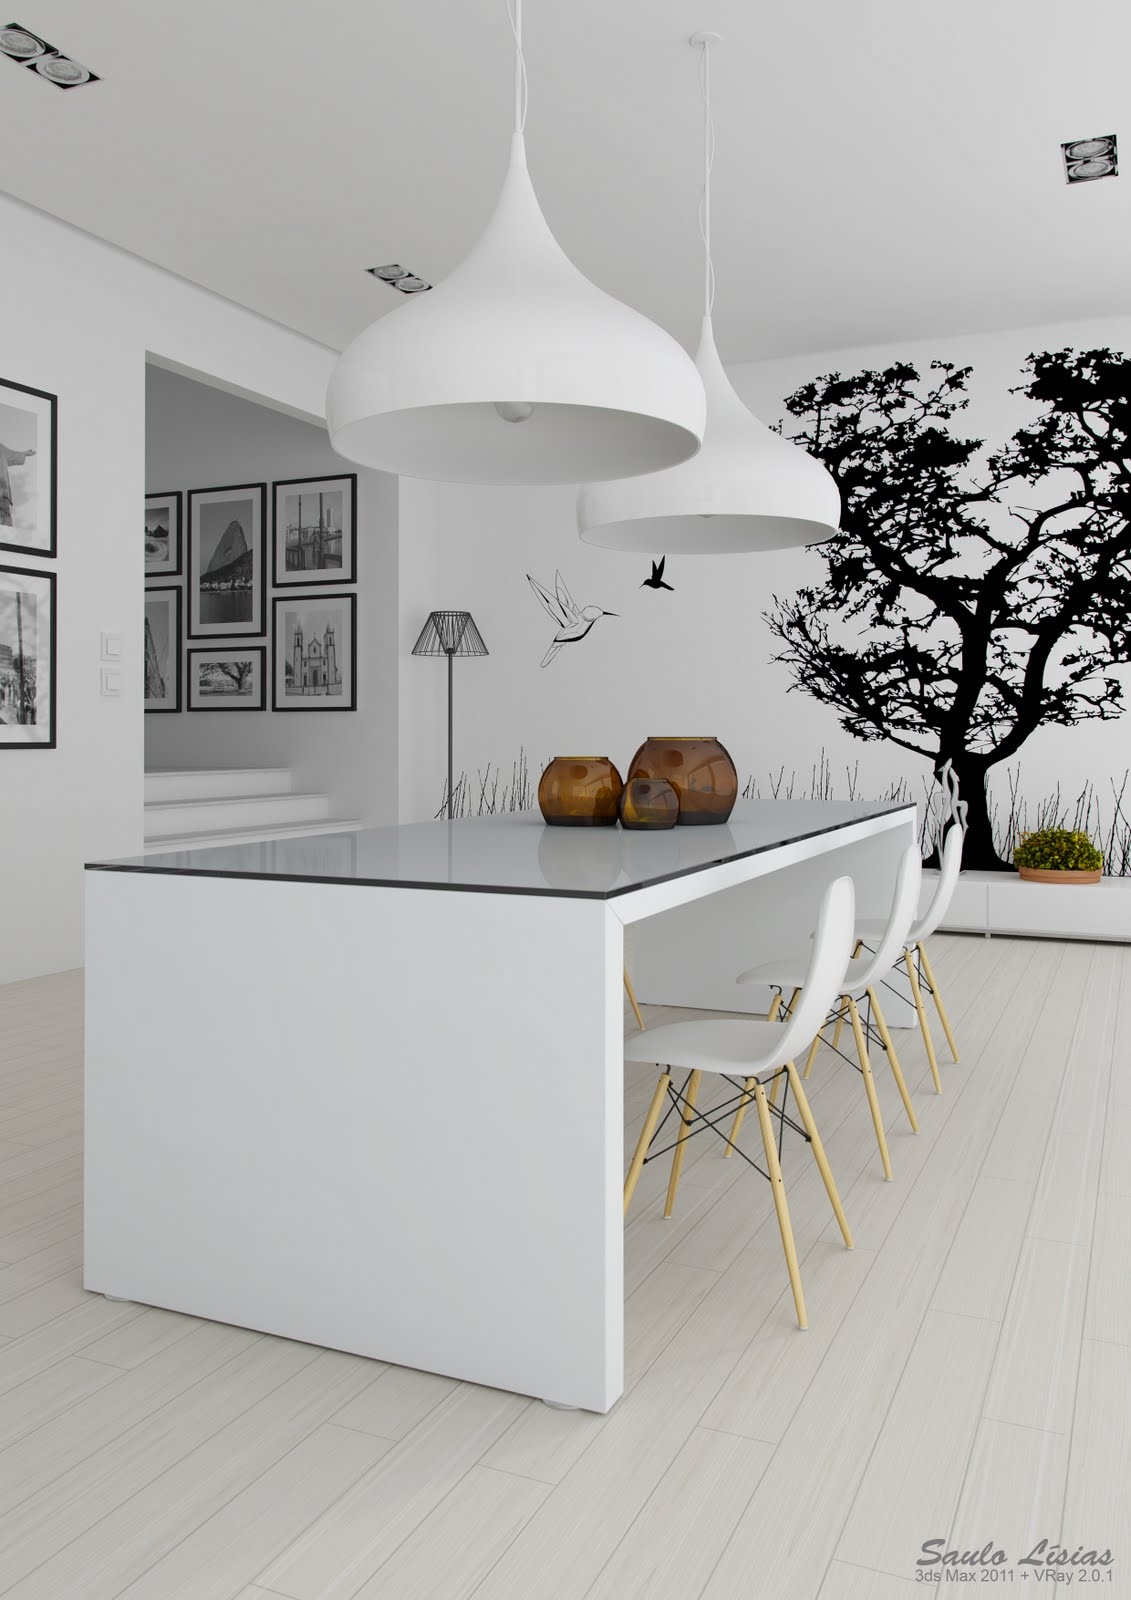 Home Interior Designs For Kitchens: 3 Black And White Kitchen